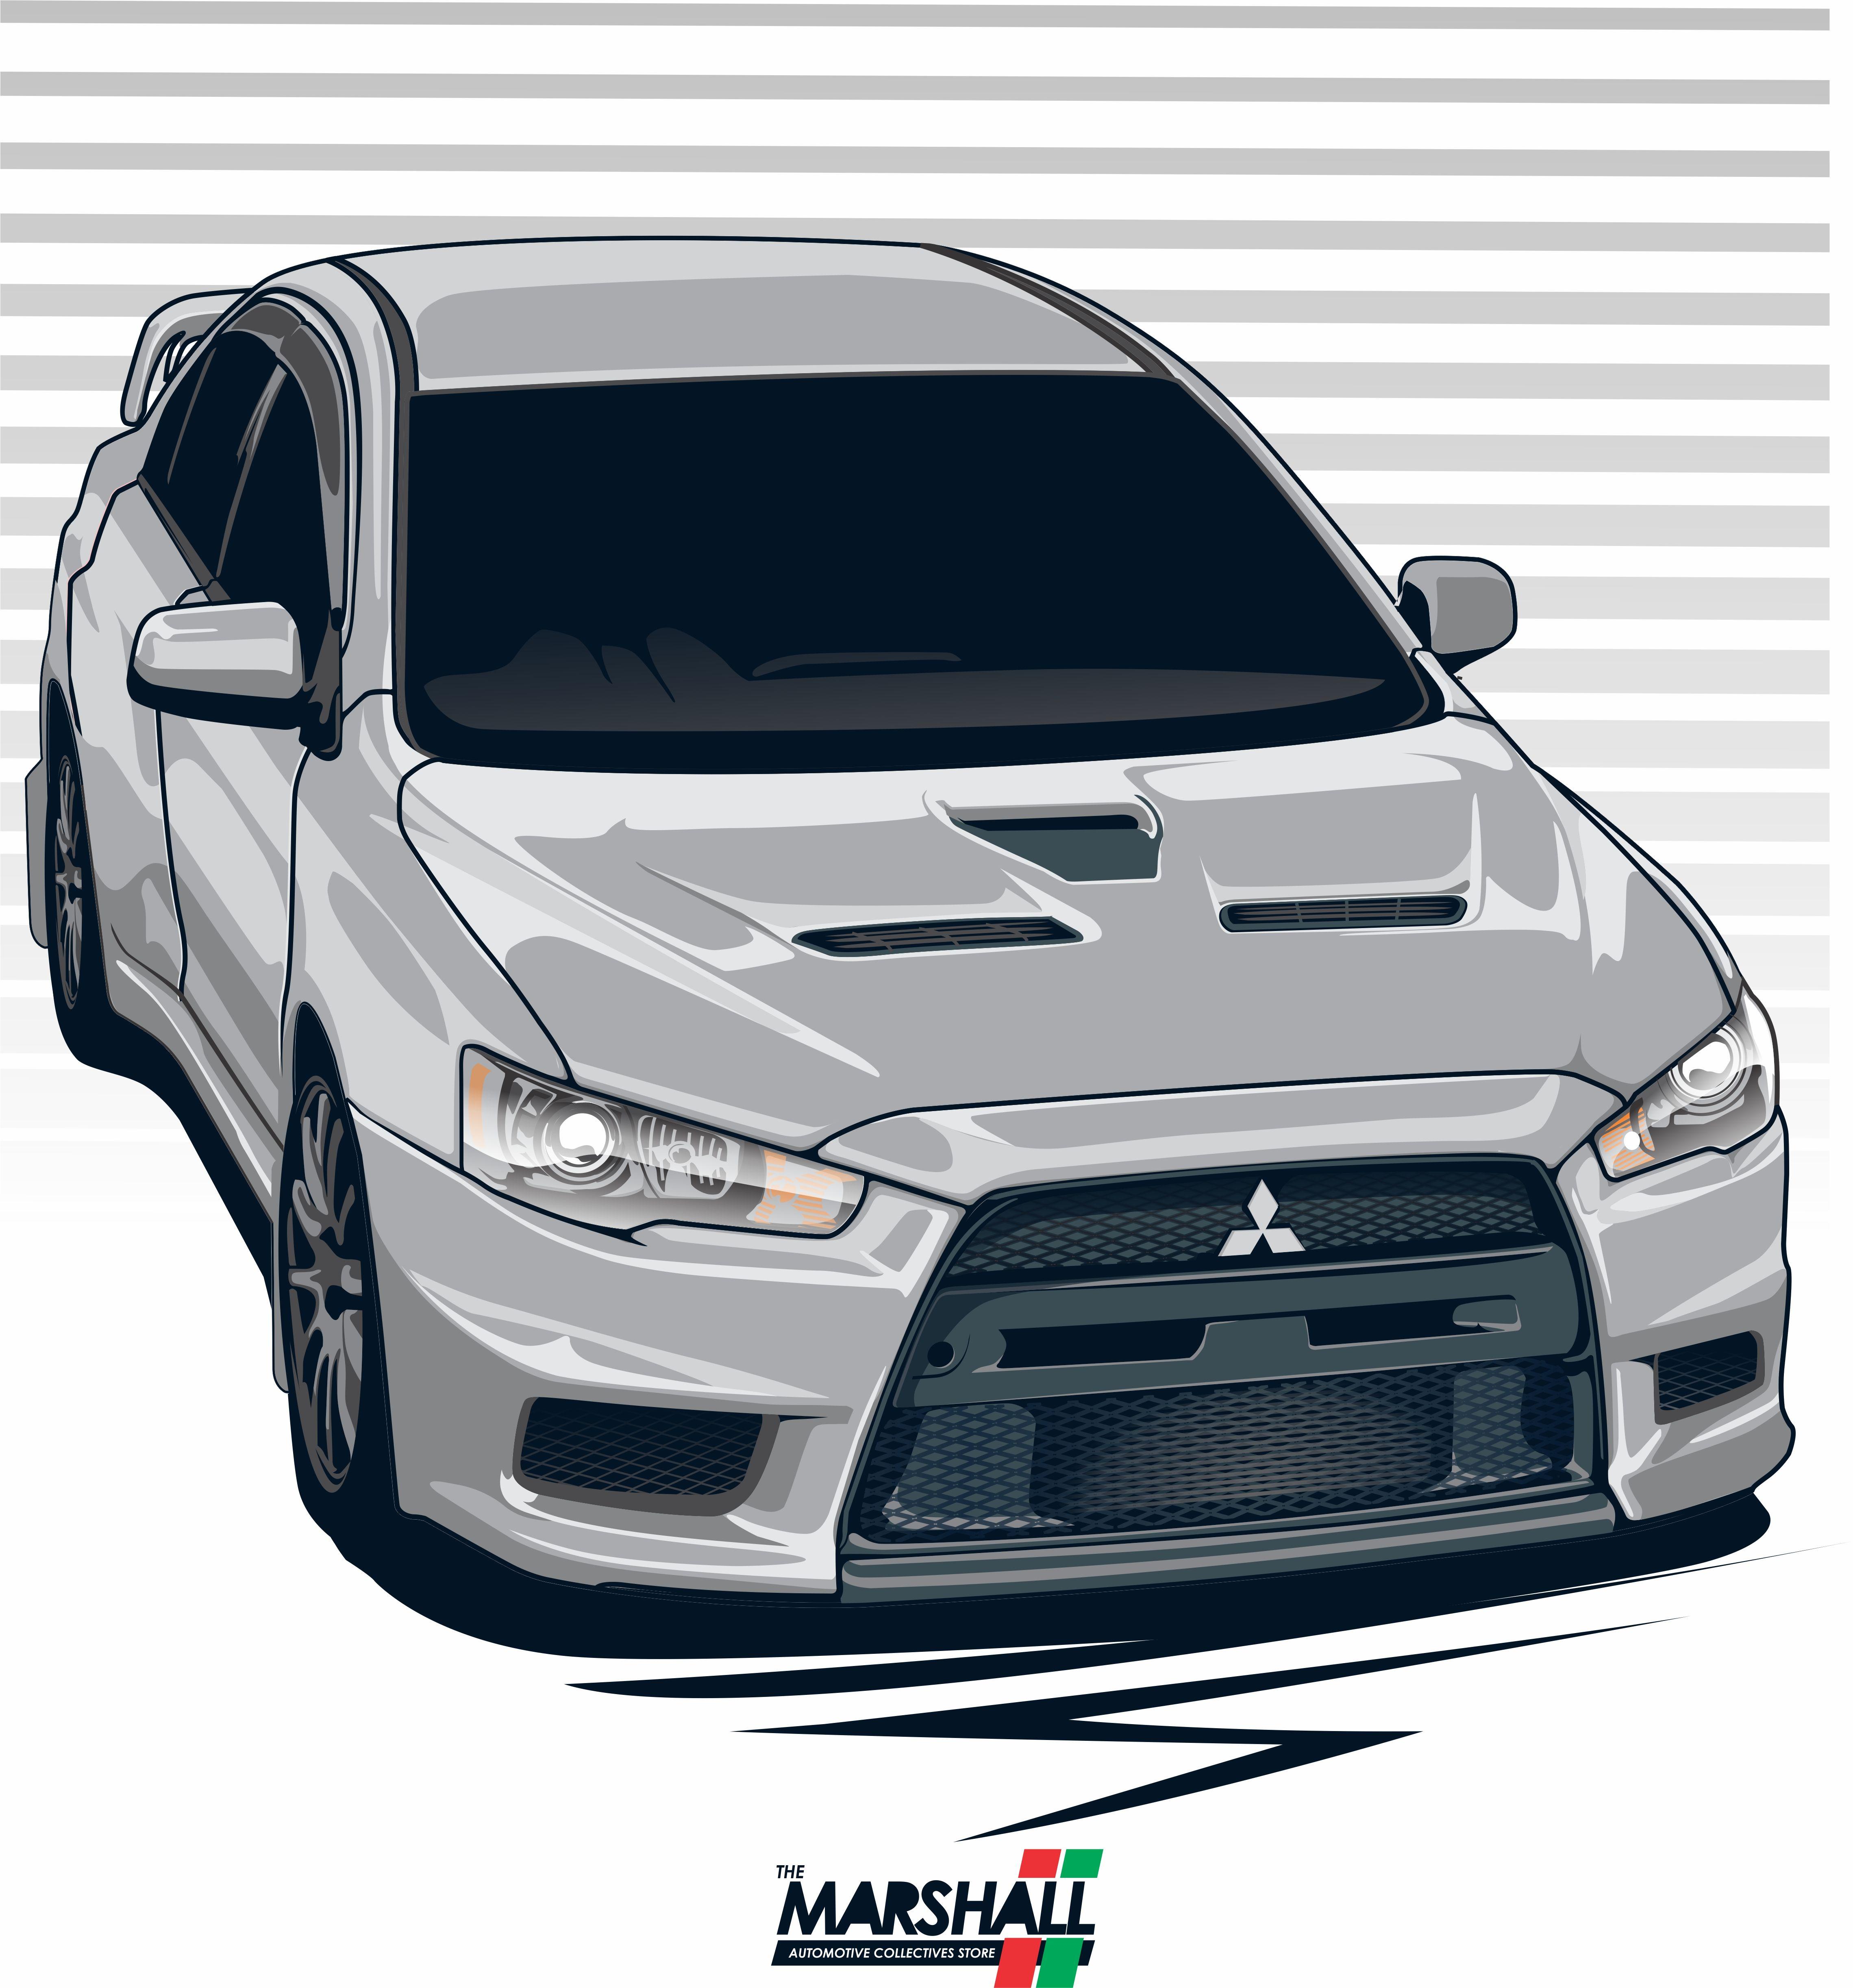 Lancer evo ultrahd background wallpaper for wide 16:10 5:3 widescreen wuxga wxga wga 4k uhd tv 16:9 4k & Mitsubishi Lancer Evo X Mitsubishi Evo Mitsubishi Lancer Evolution Mitsubishi Lancer